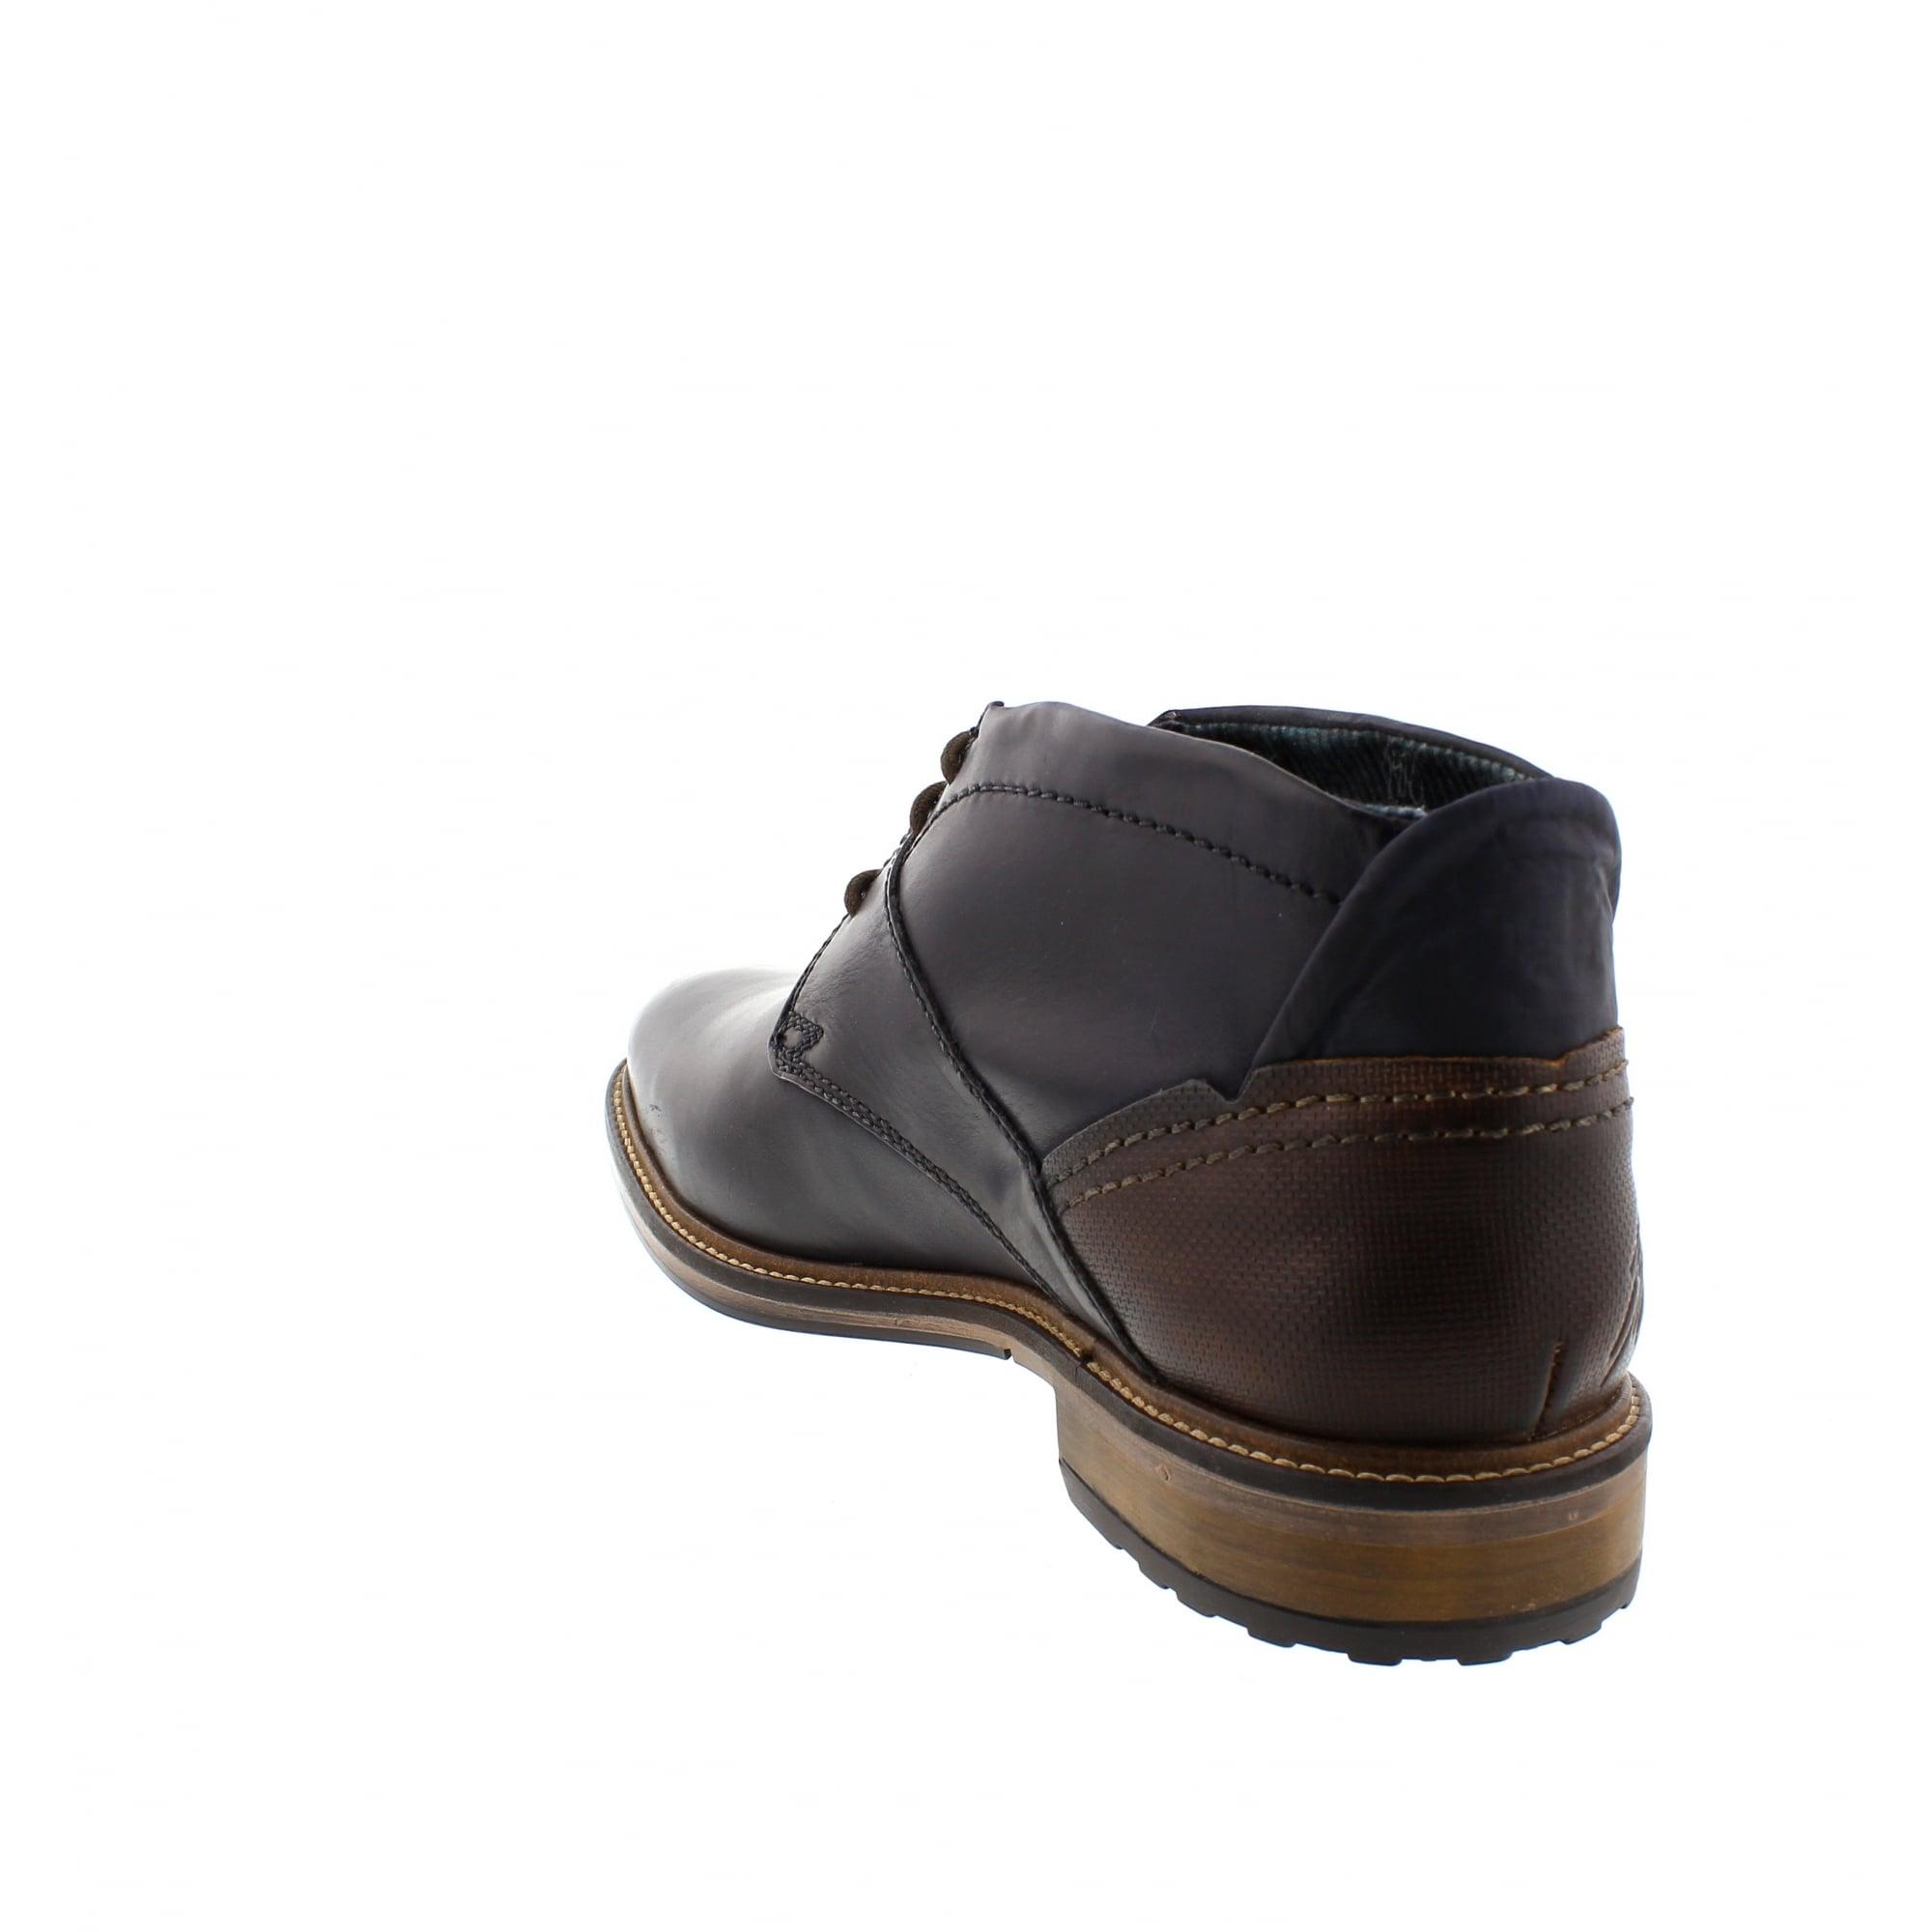 4100 37734 From 311 Mens Uk Bugatti Rogerson Marcello 1100 Shoes wEpBOyIq